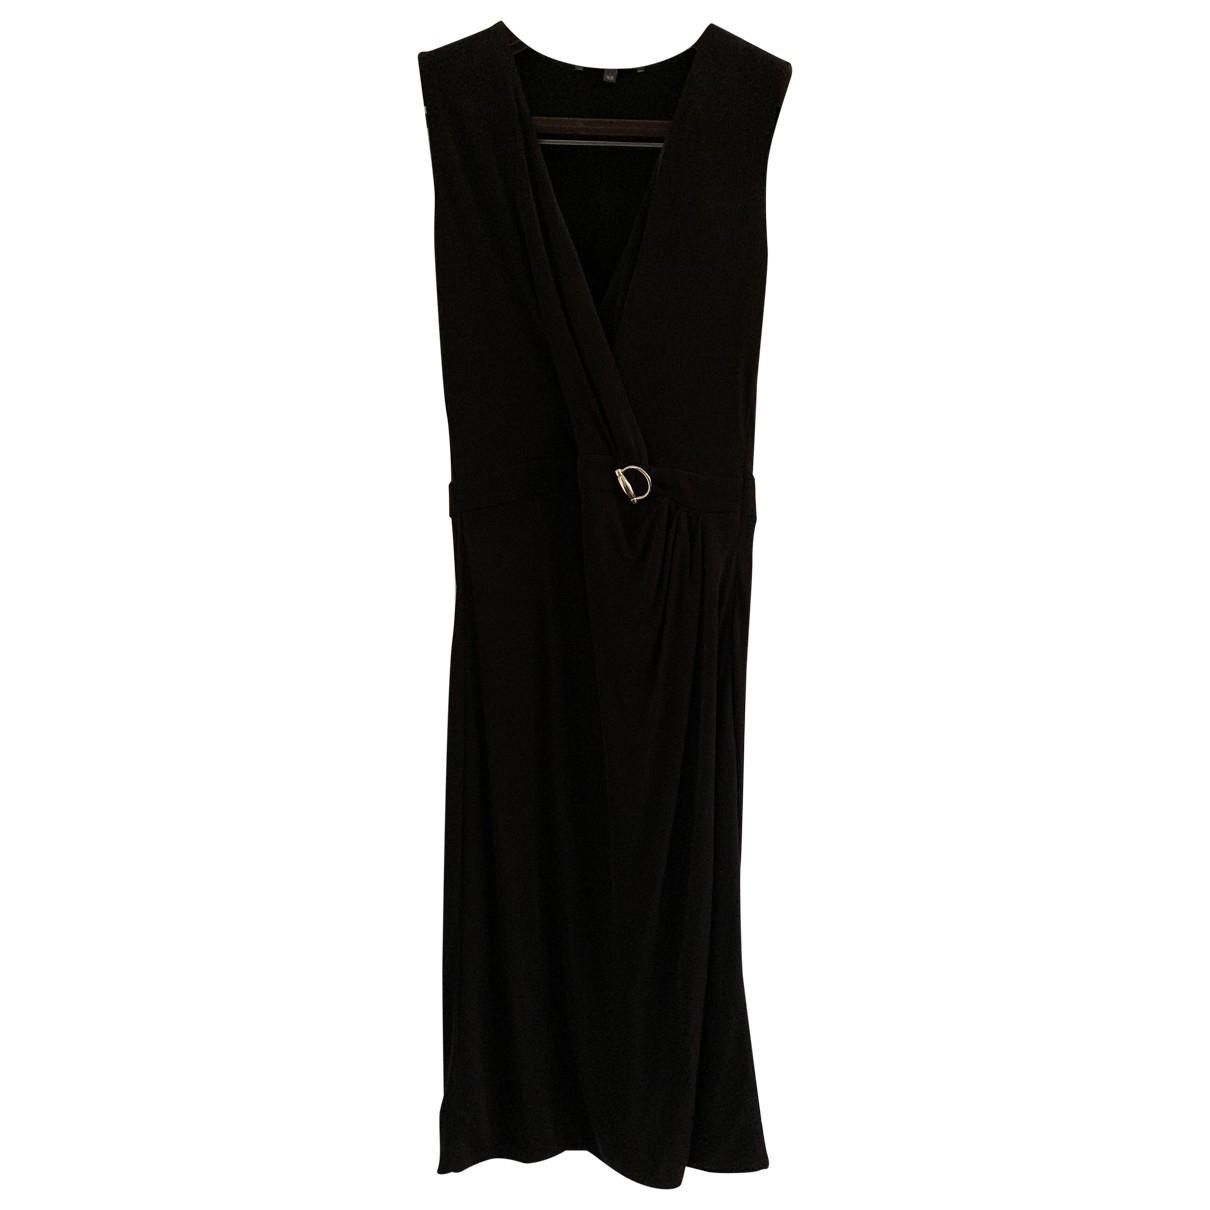 Gucci \N Black dress for Women XS International